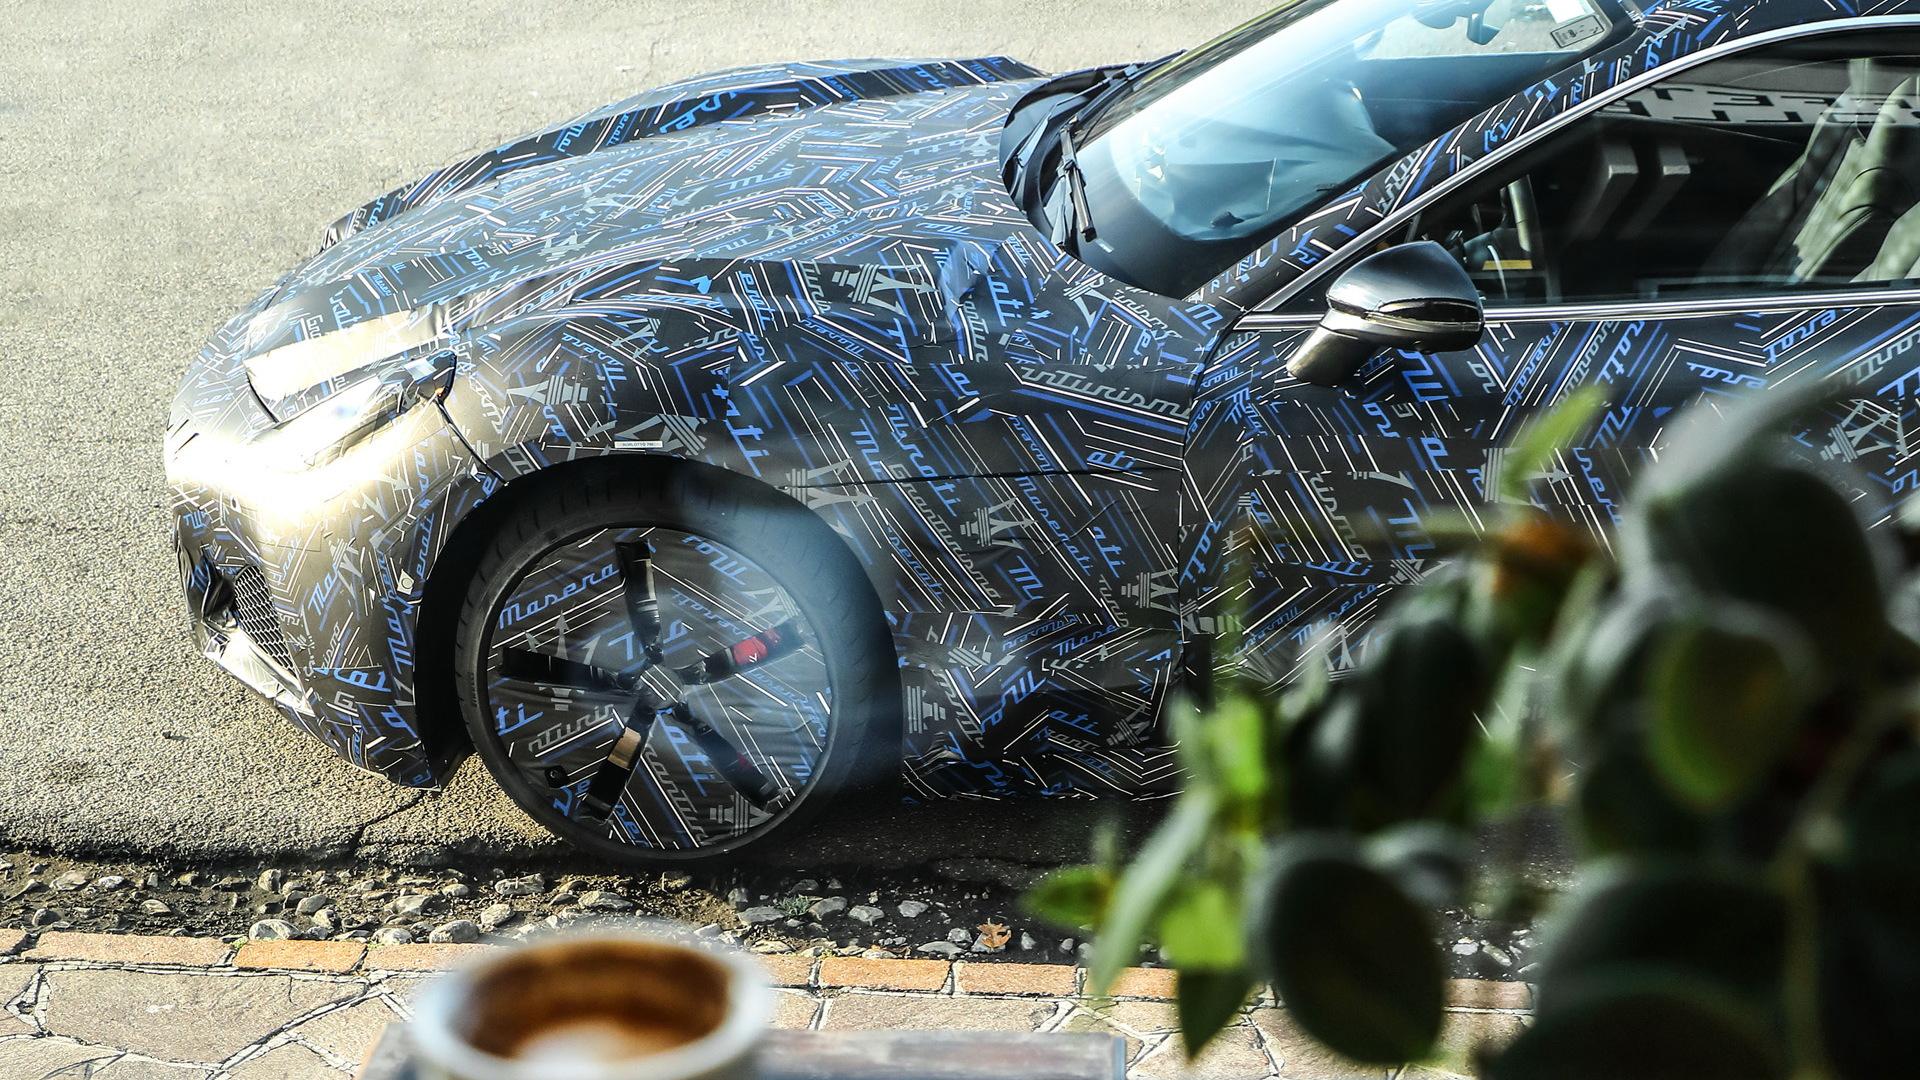 New Maserati GranTurismo prototype